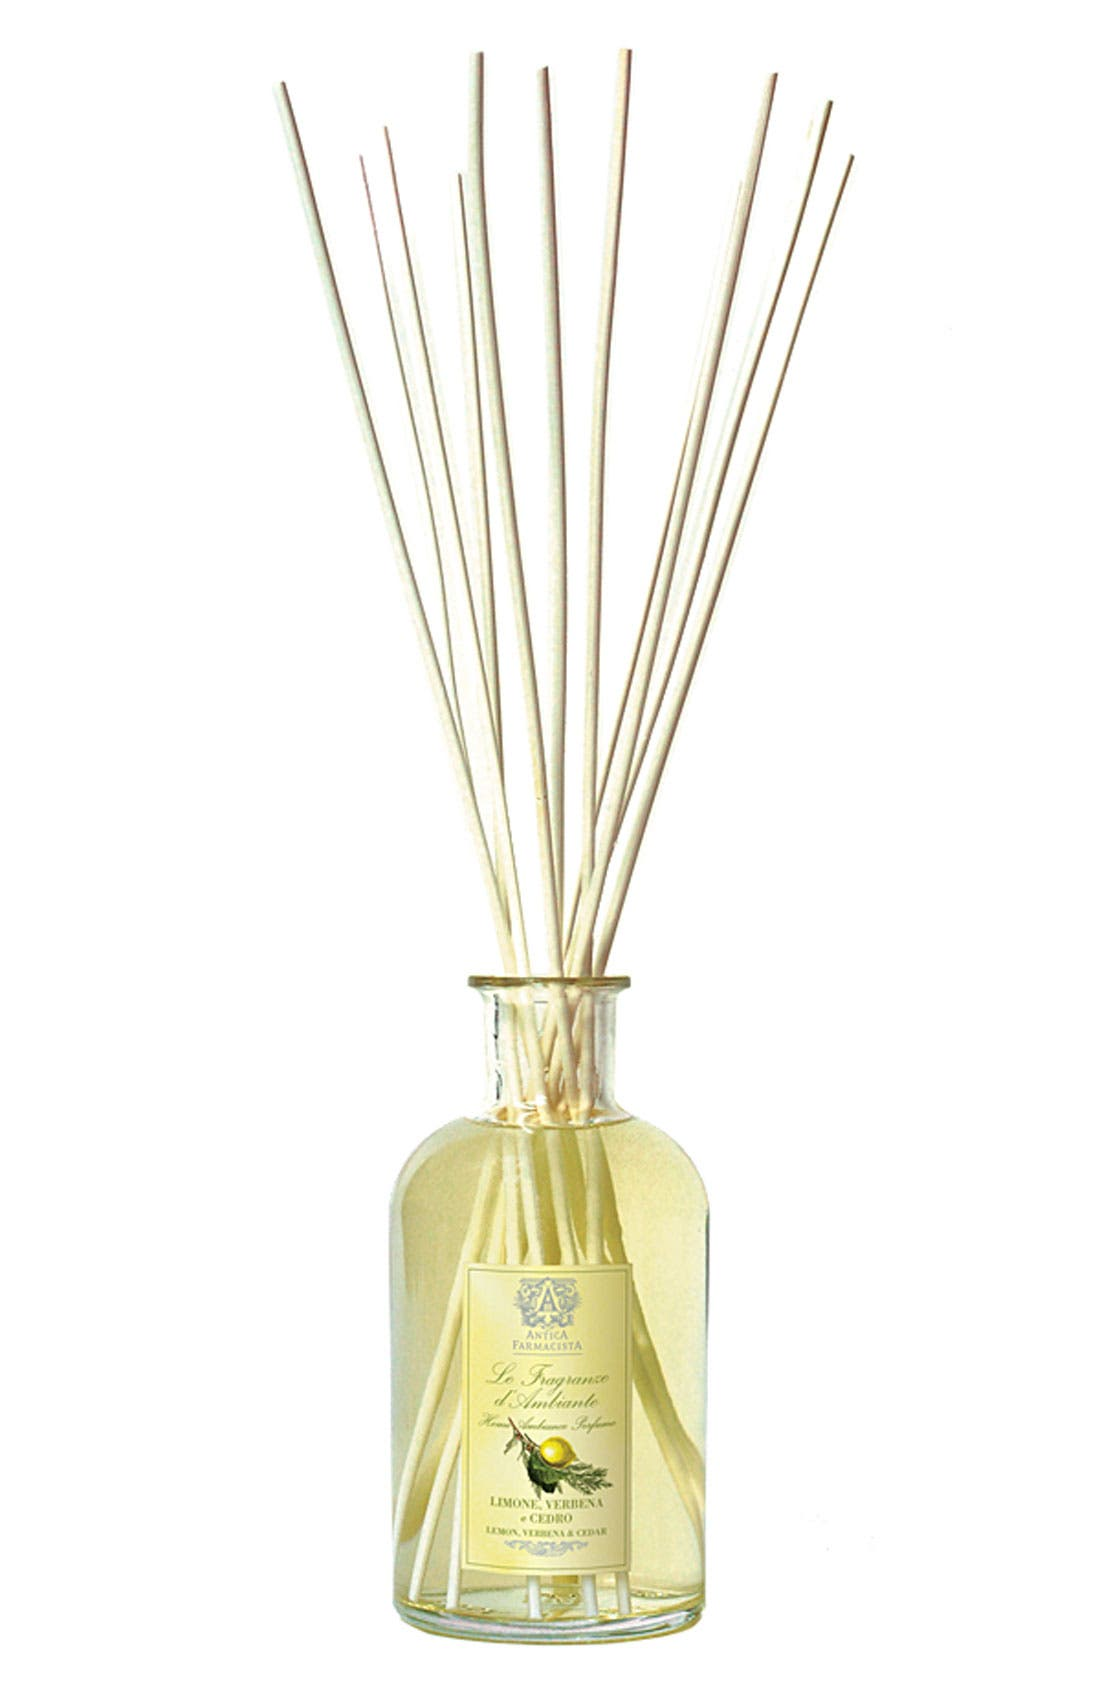 Antica Farmacista Lemon, Verbena & Cedar Home Ambiance Perfume